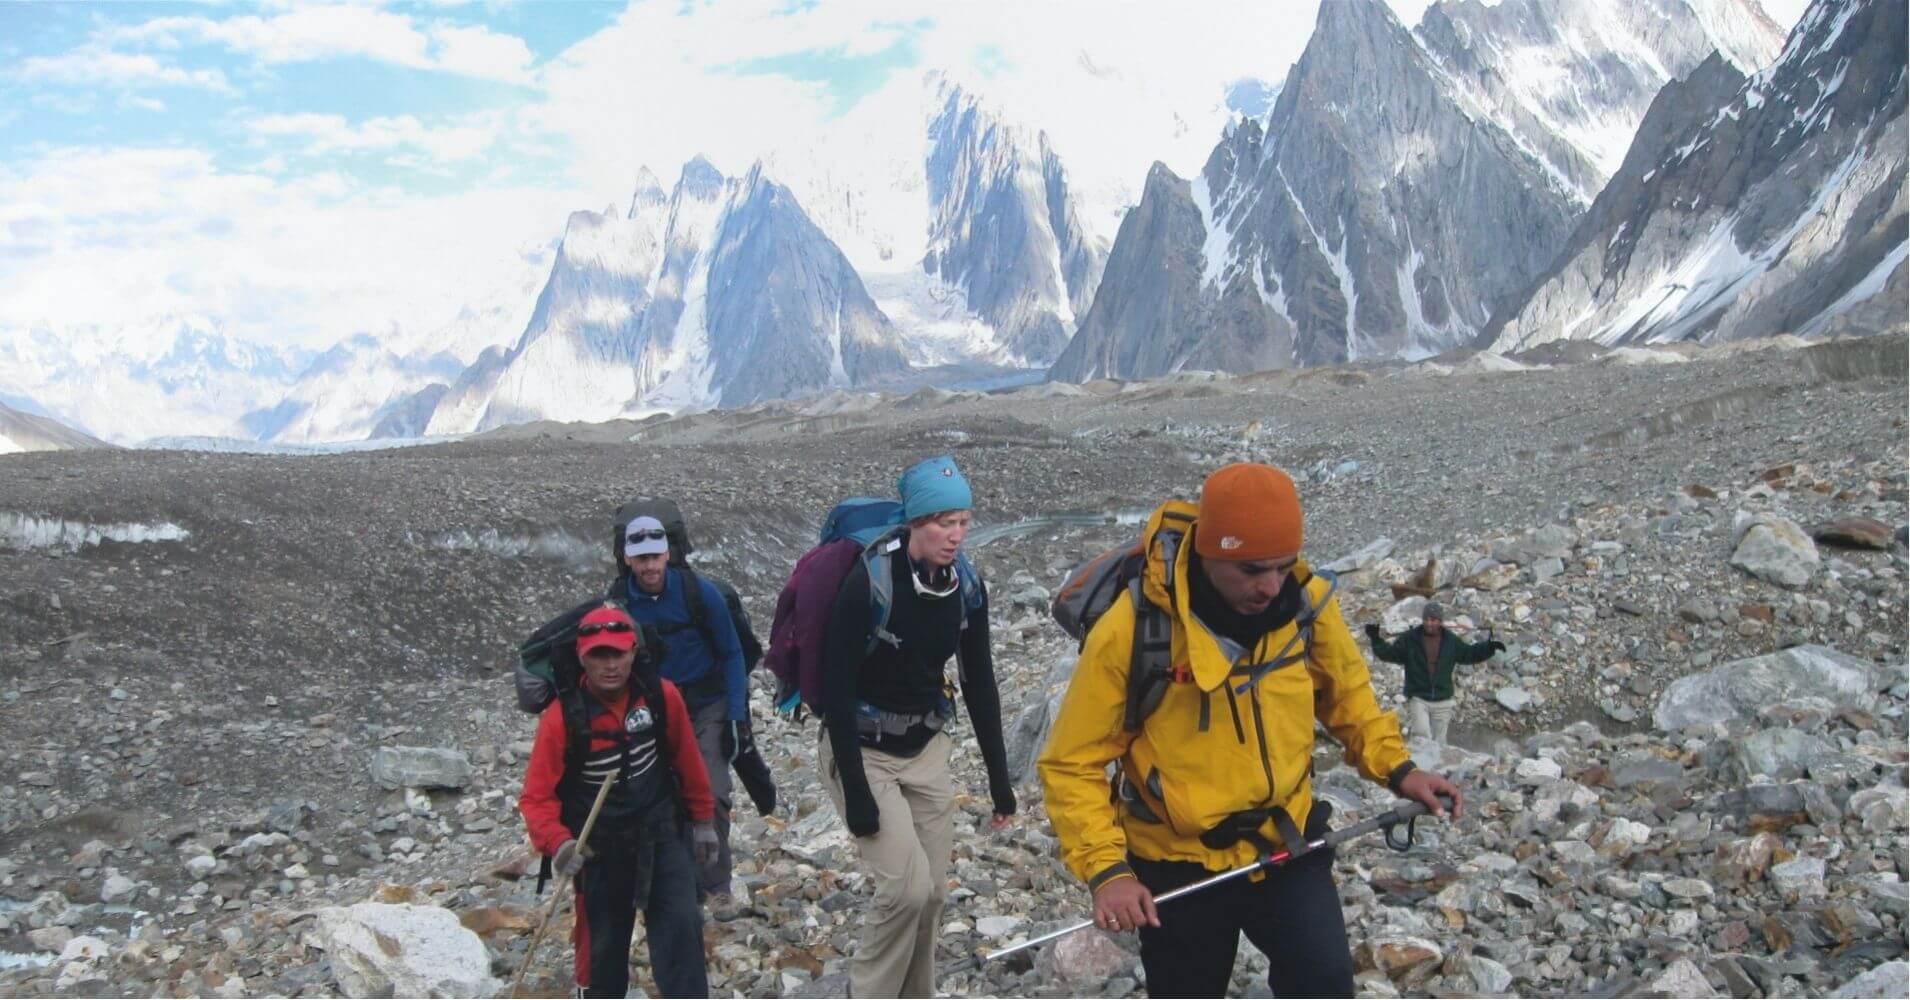 Trekking Campo Base del Pico K2, Pakistán.